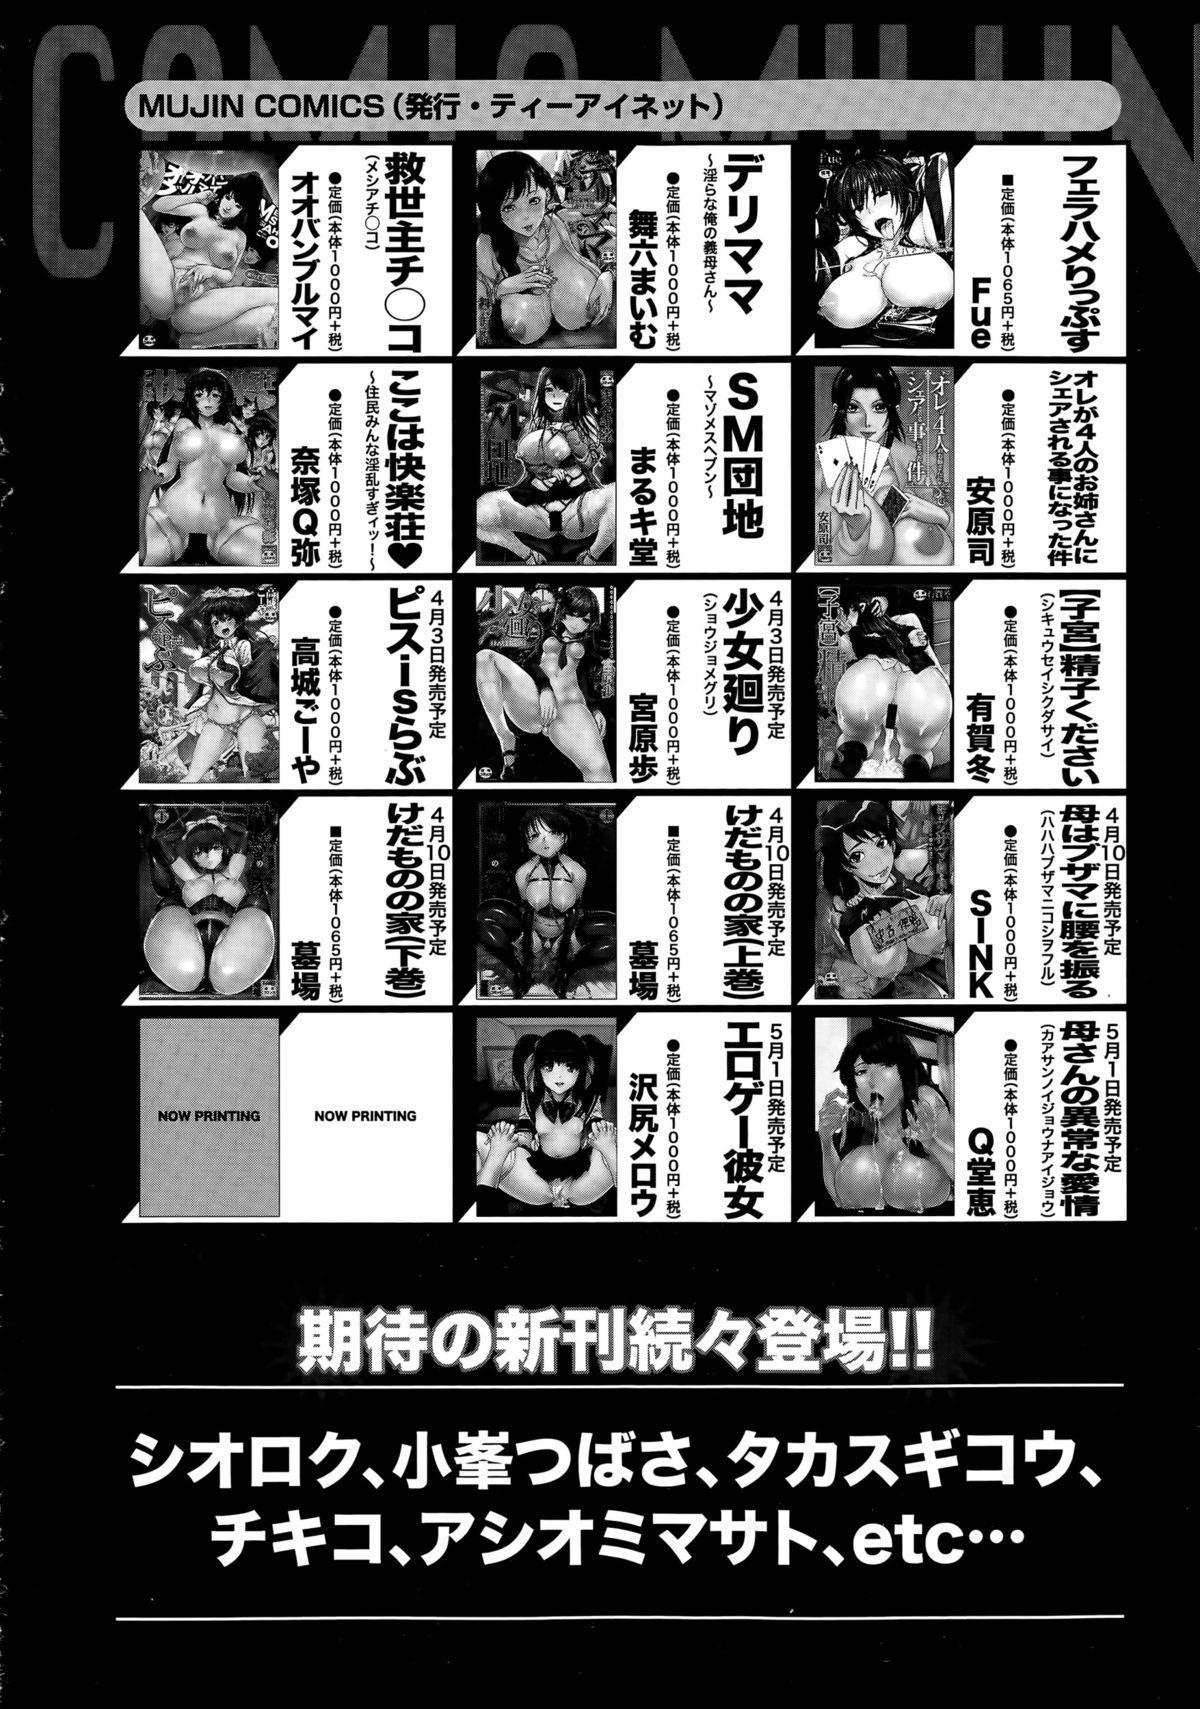 COMIC Mugen Tensei 2015-05 598